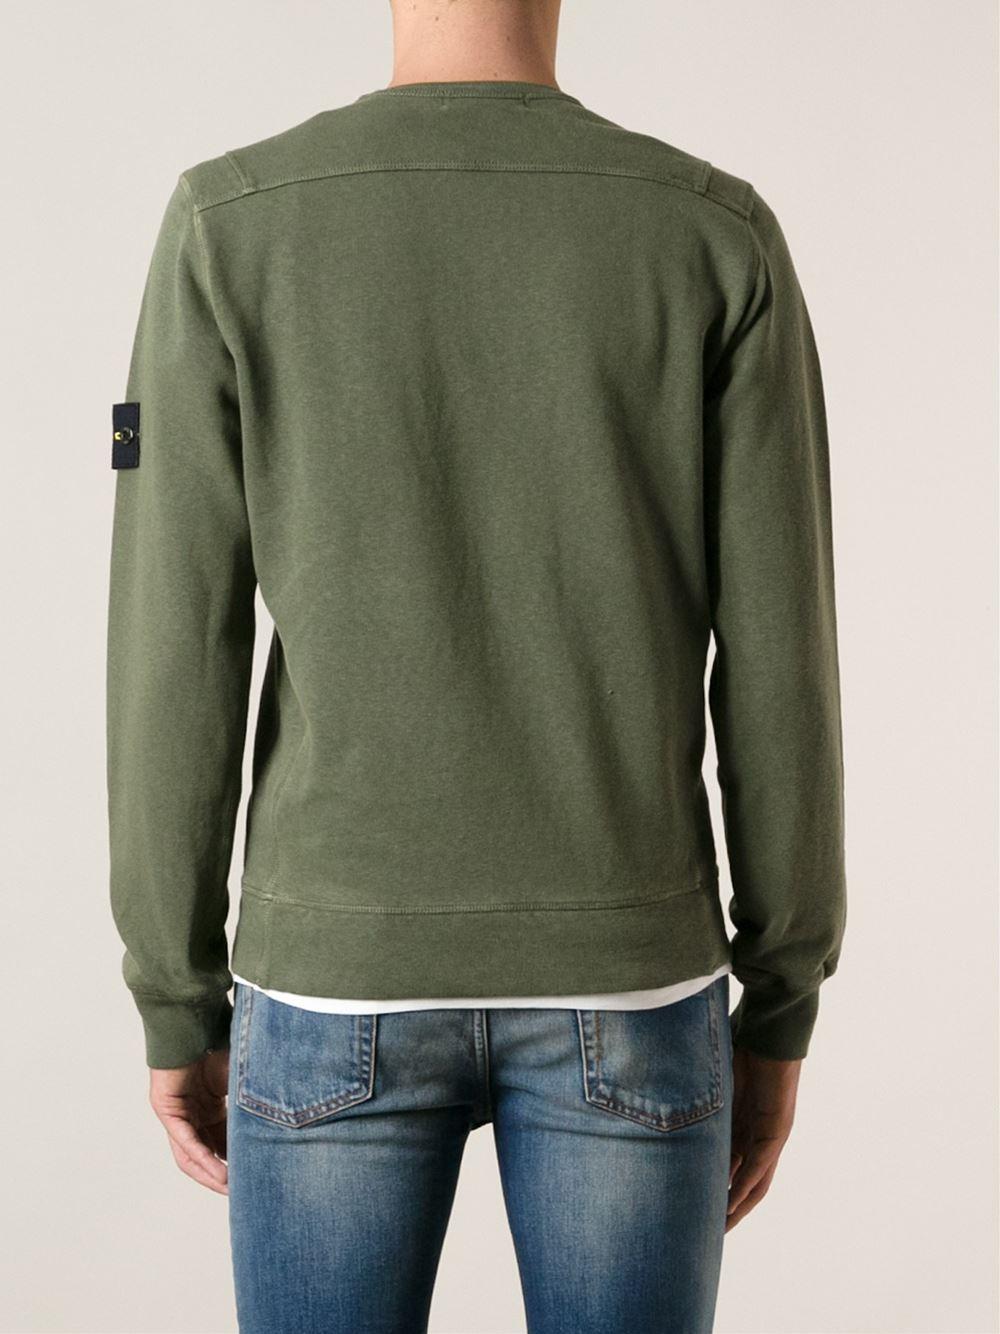 Lyst Stone Island Crew Neck Sweatshirt In Green For Men